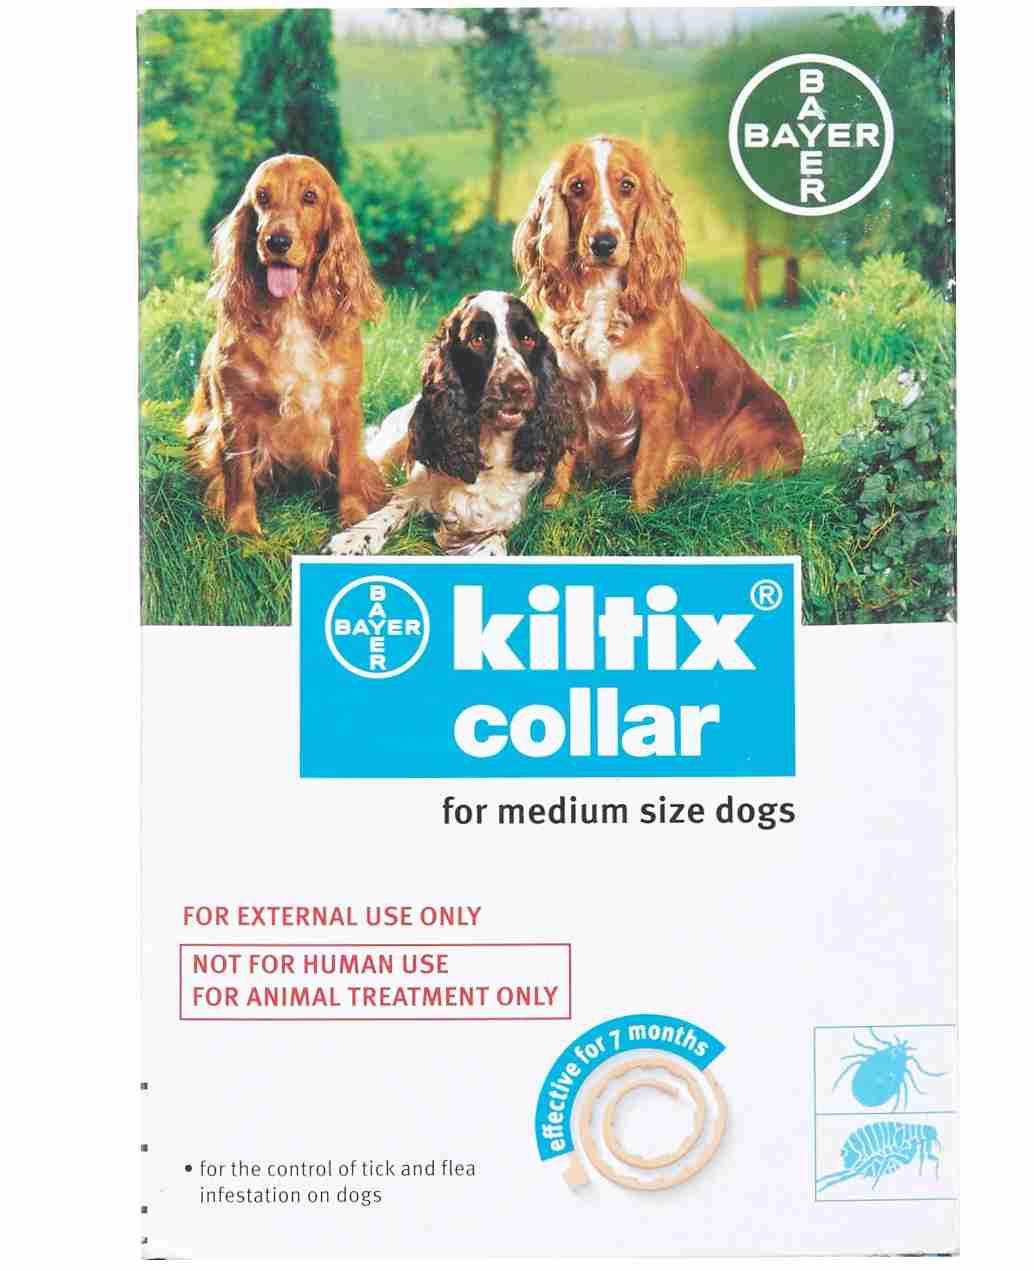 Bayer Kiltix Collar for Fleas and Ticks